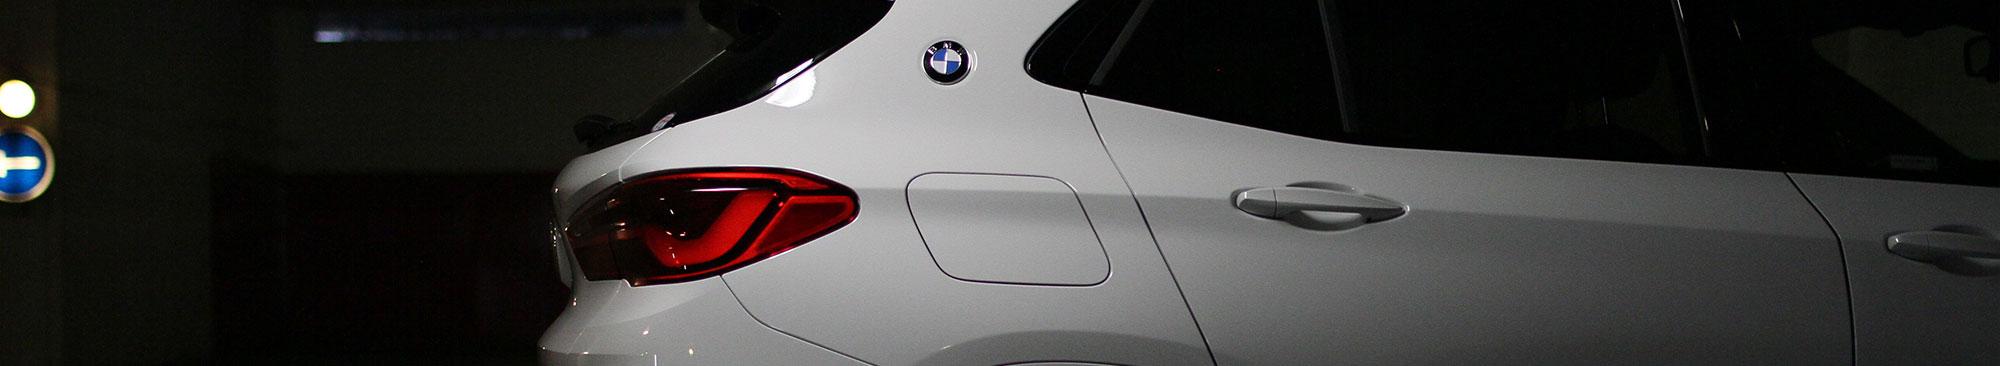 BMW x1 garage bmw-logo